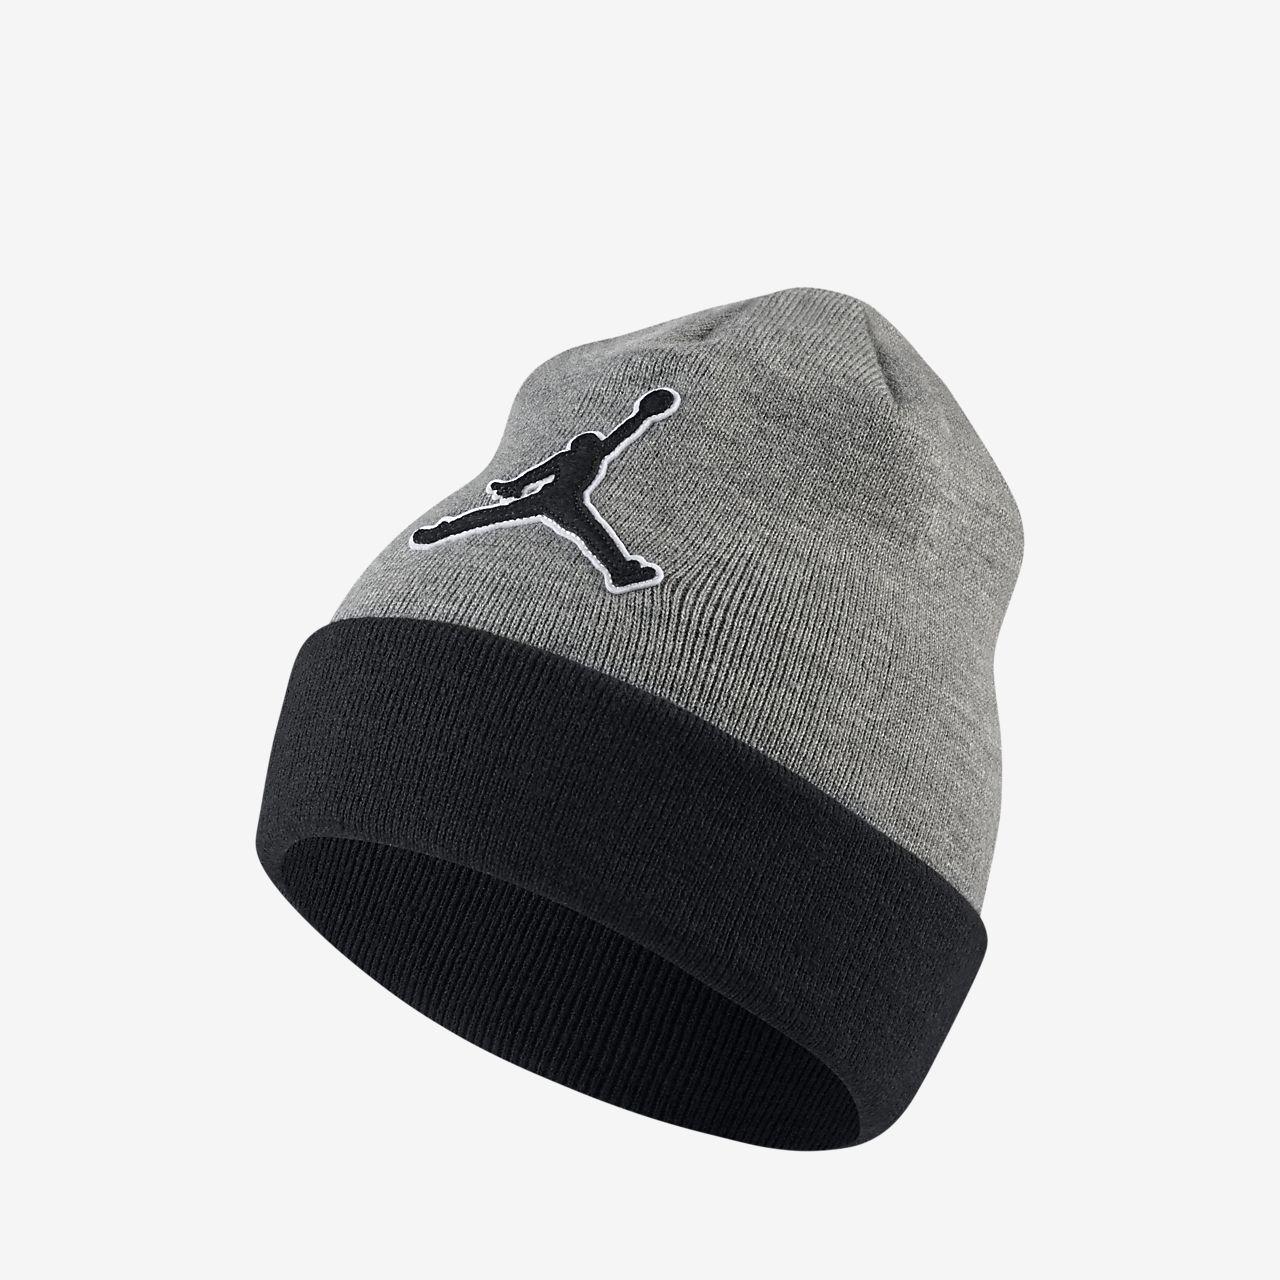 3bd323bed8689d ... cheap jordan graphic knit hat 2ef5a b2b56